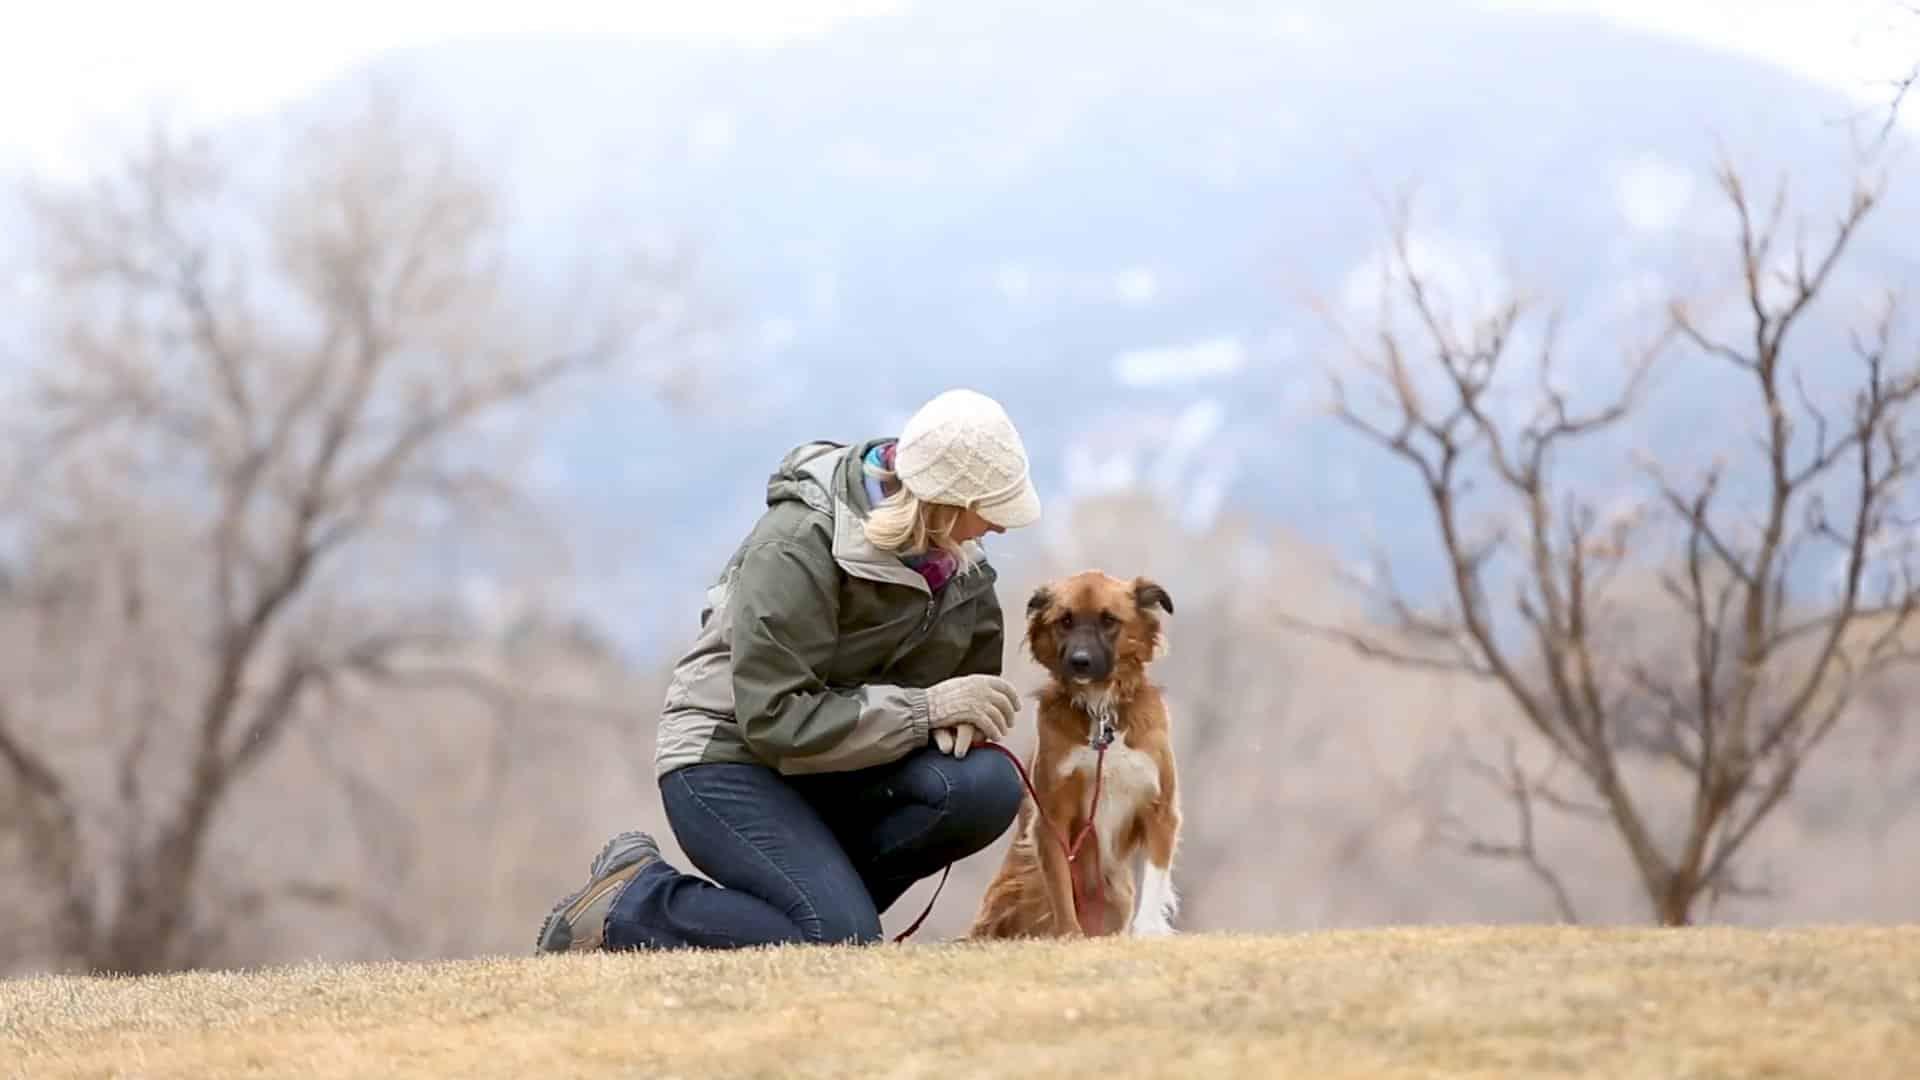 HPC Jessica Coversion Copywriting puppy mountains